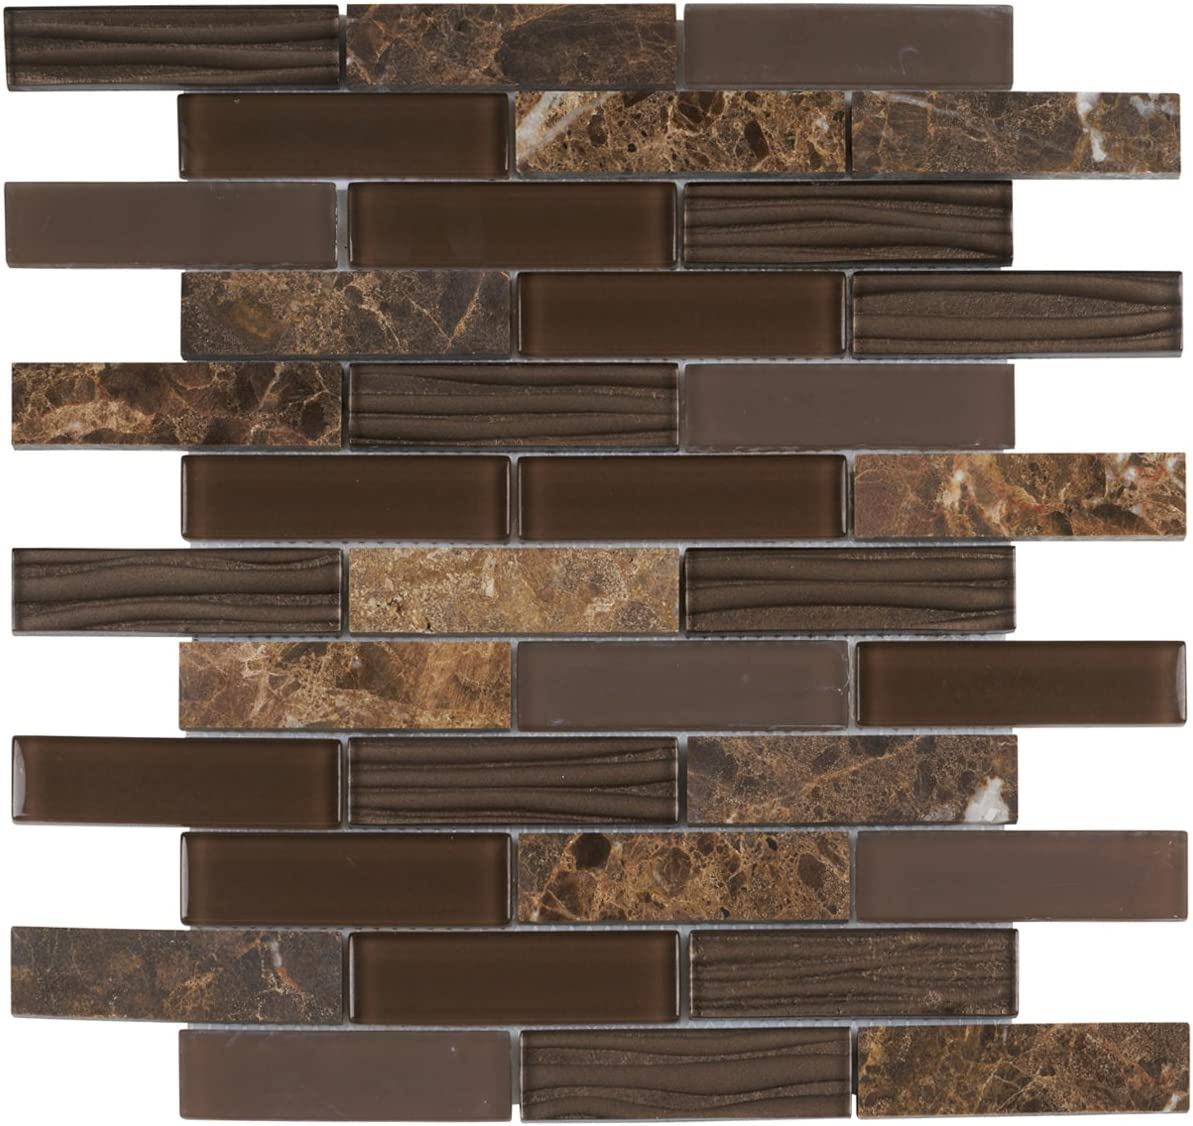 - Modket TDH61MO Emperador Dark Brown Marble Stone Mosaic Tile, Wave Cold  Spray, Glass Blended Brick Joint Pattern Backsplash - - Amazon.com